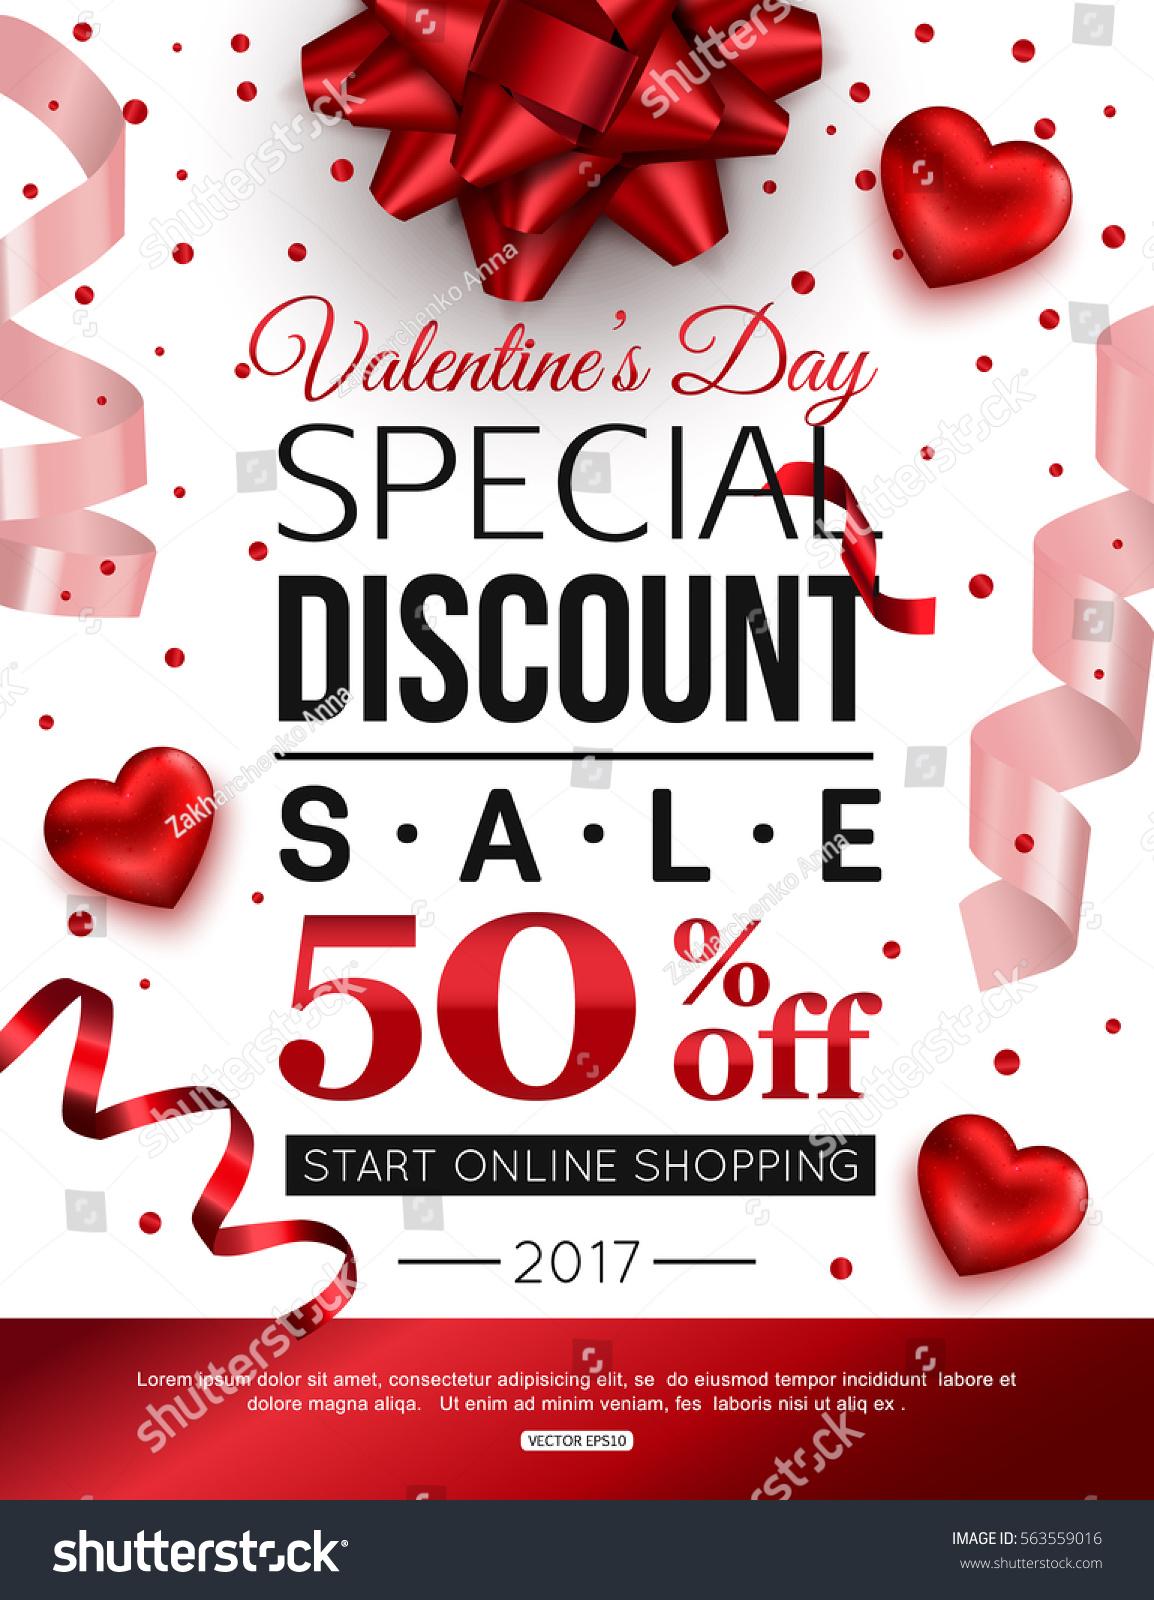 Valentine's day online shopping